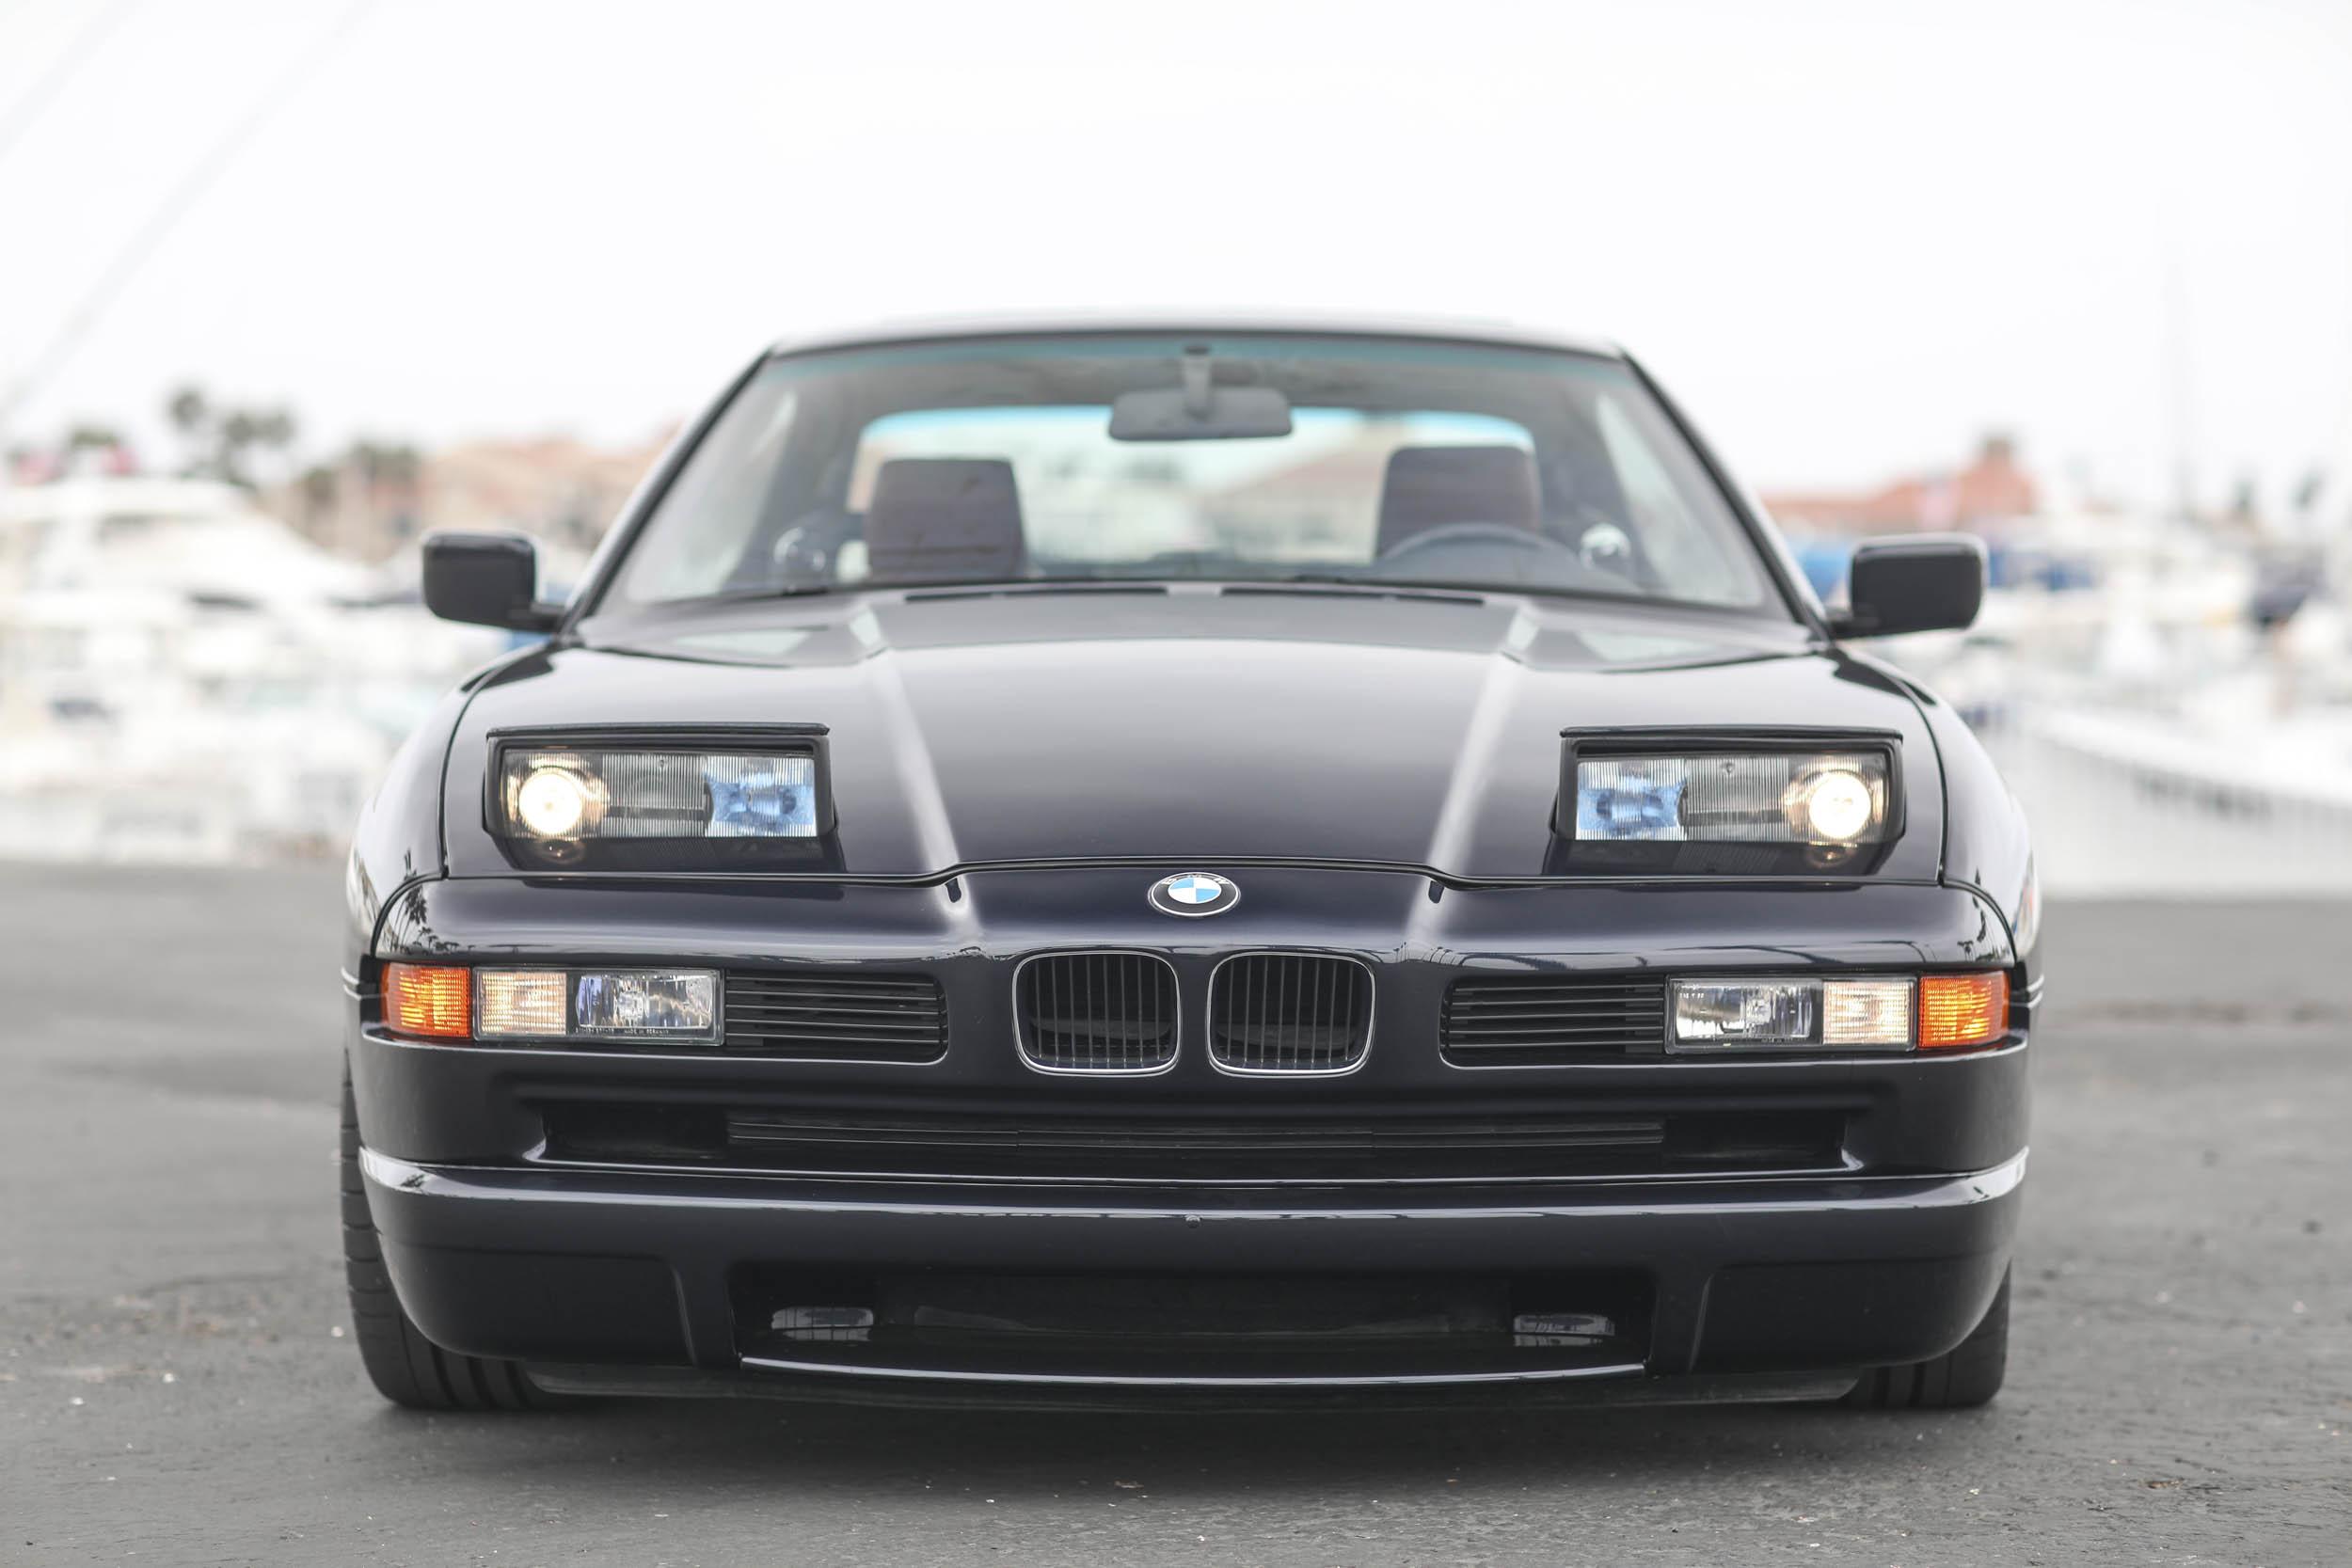 1993 BMW 850Ci front